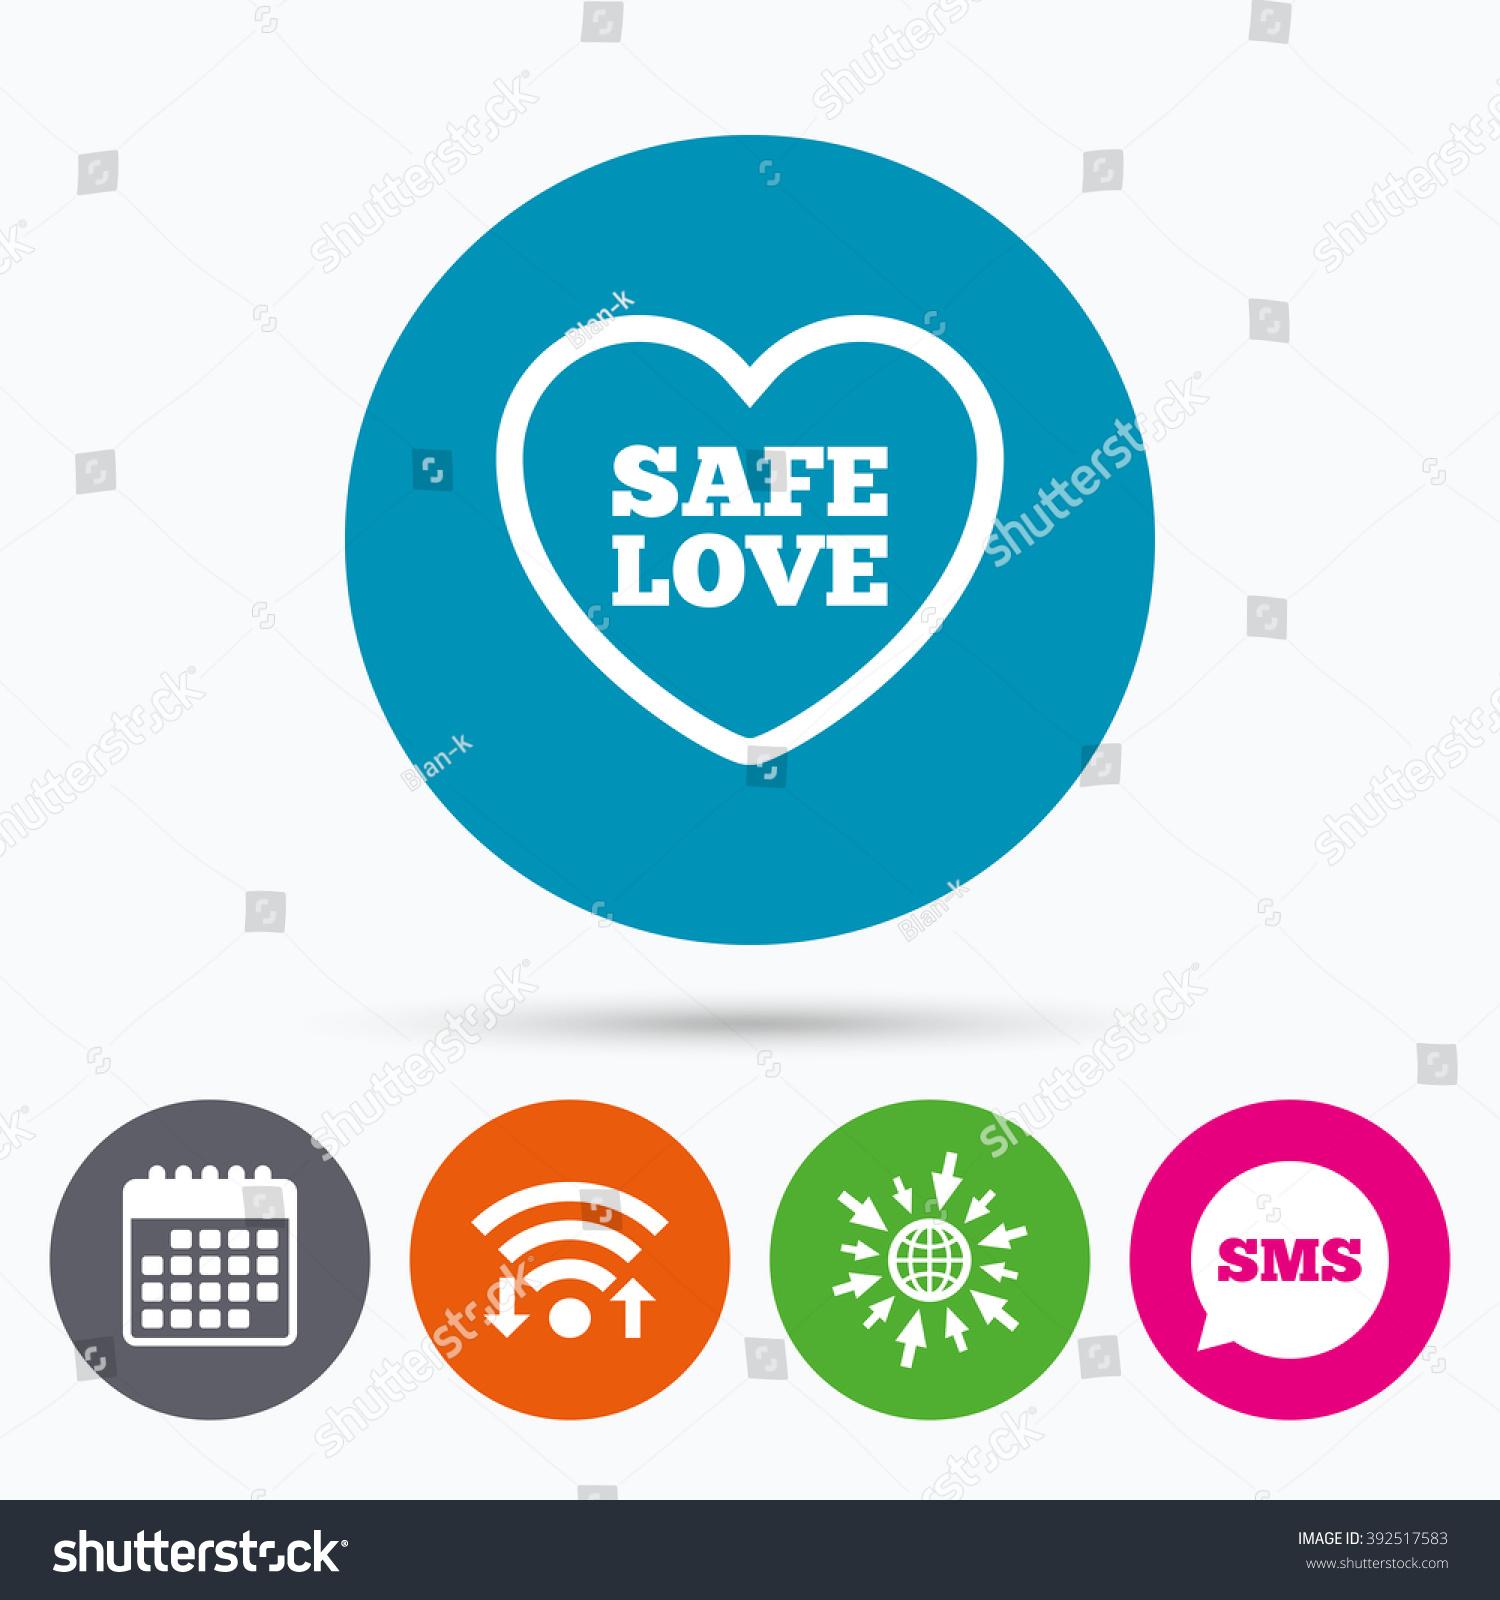 Wifi sms calendar icons safe love stock vector 392517583 wifi sms and calendar icons safe love sign icon safe sex symbol buycottarizona